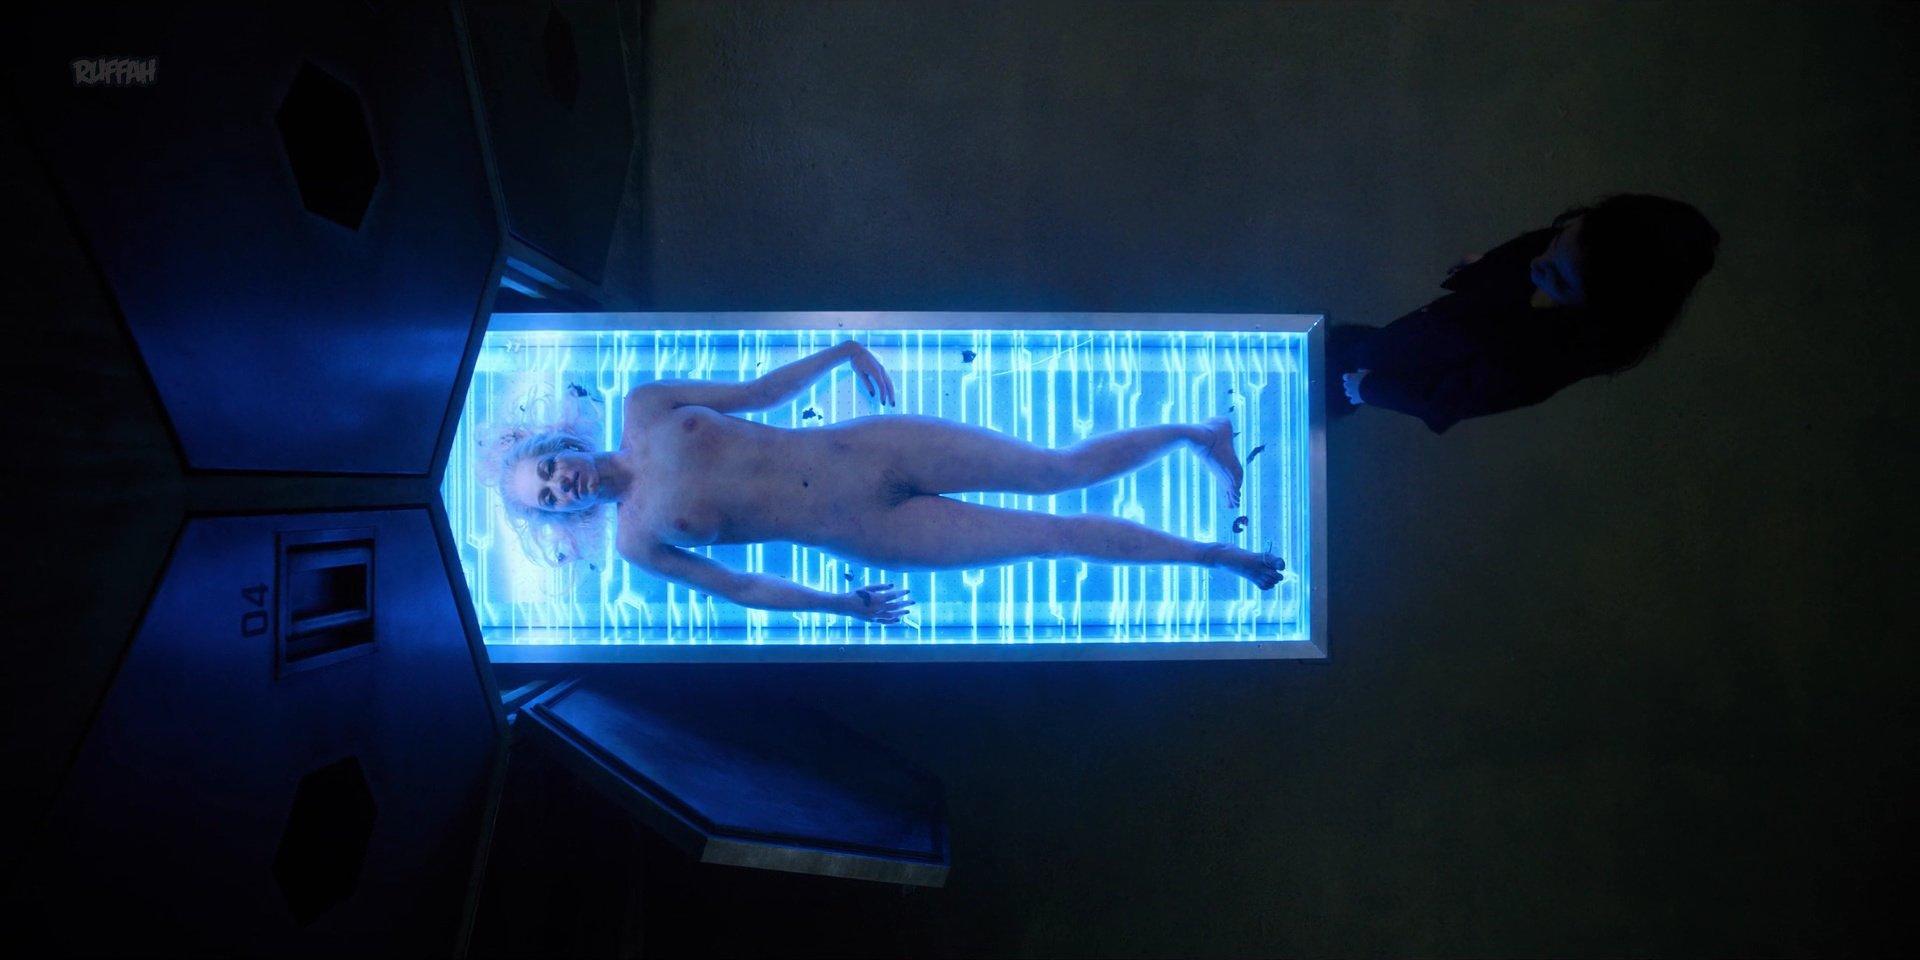 Kristin Lehmann nude, Lisa Chandler nude- Altered Carbon s01e02 (2018)